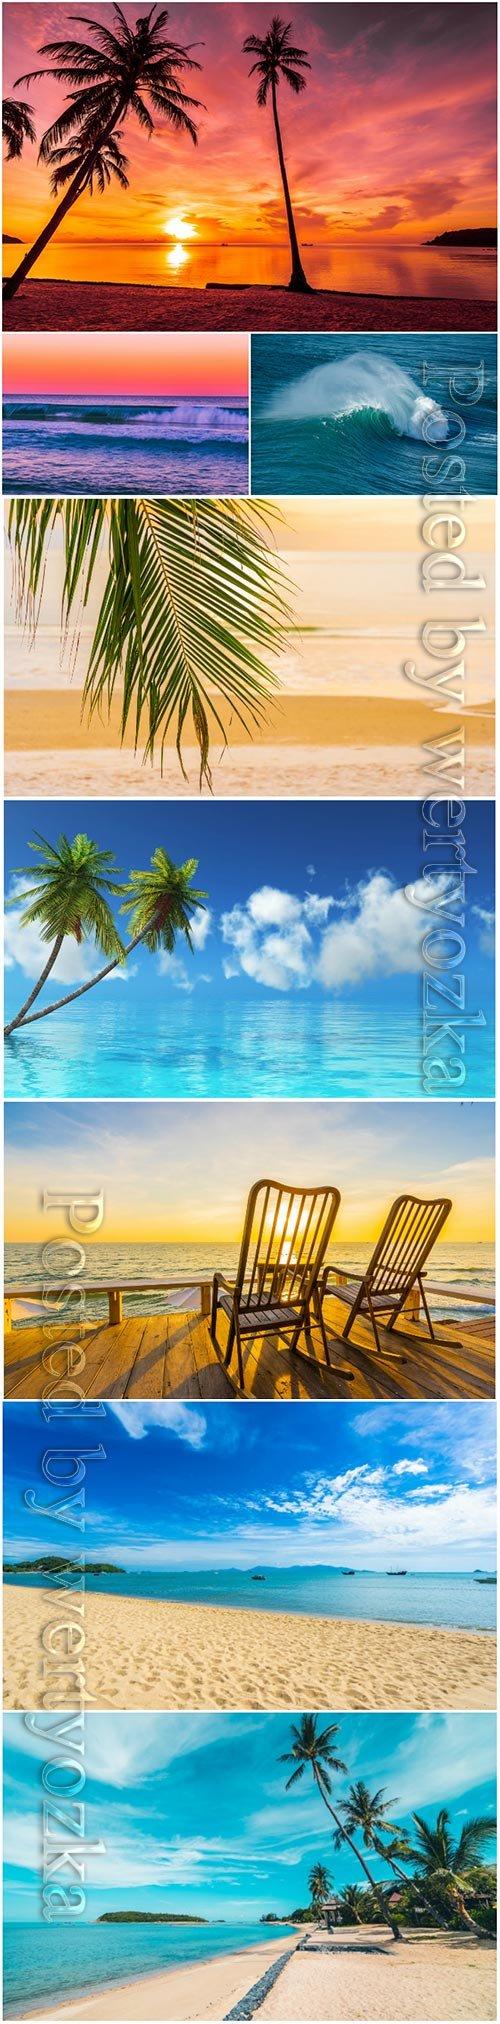 Beautiful tropical beach sea, palm tree